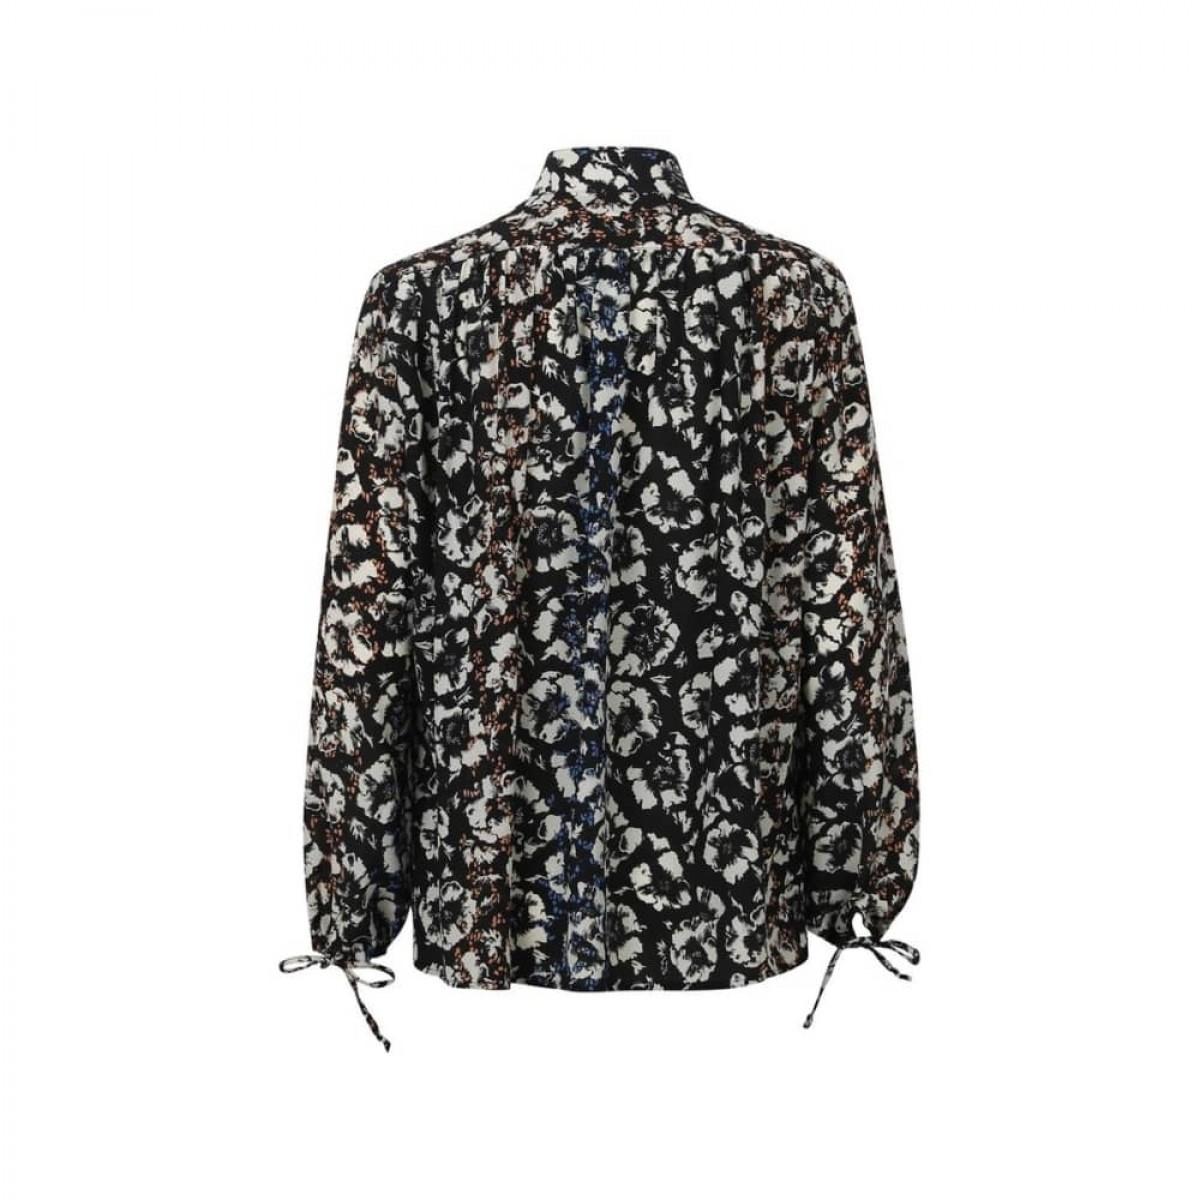 fifi bluse - black flowers - bag